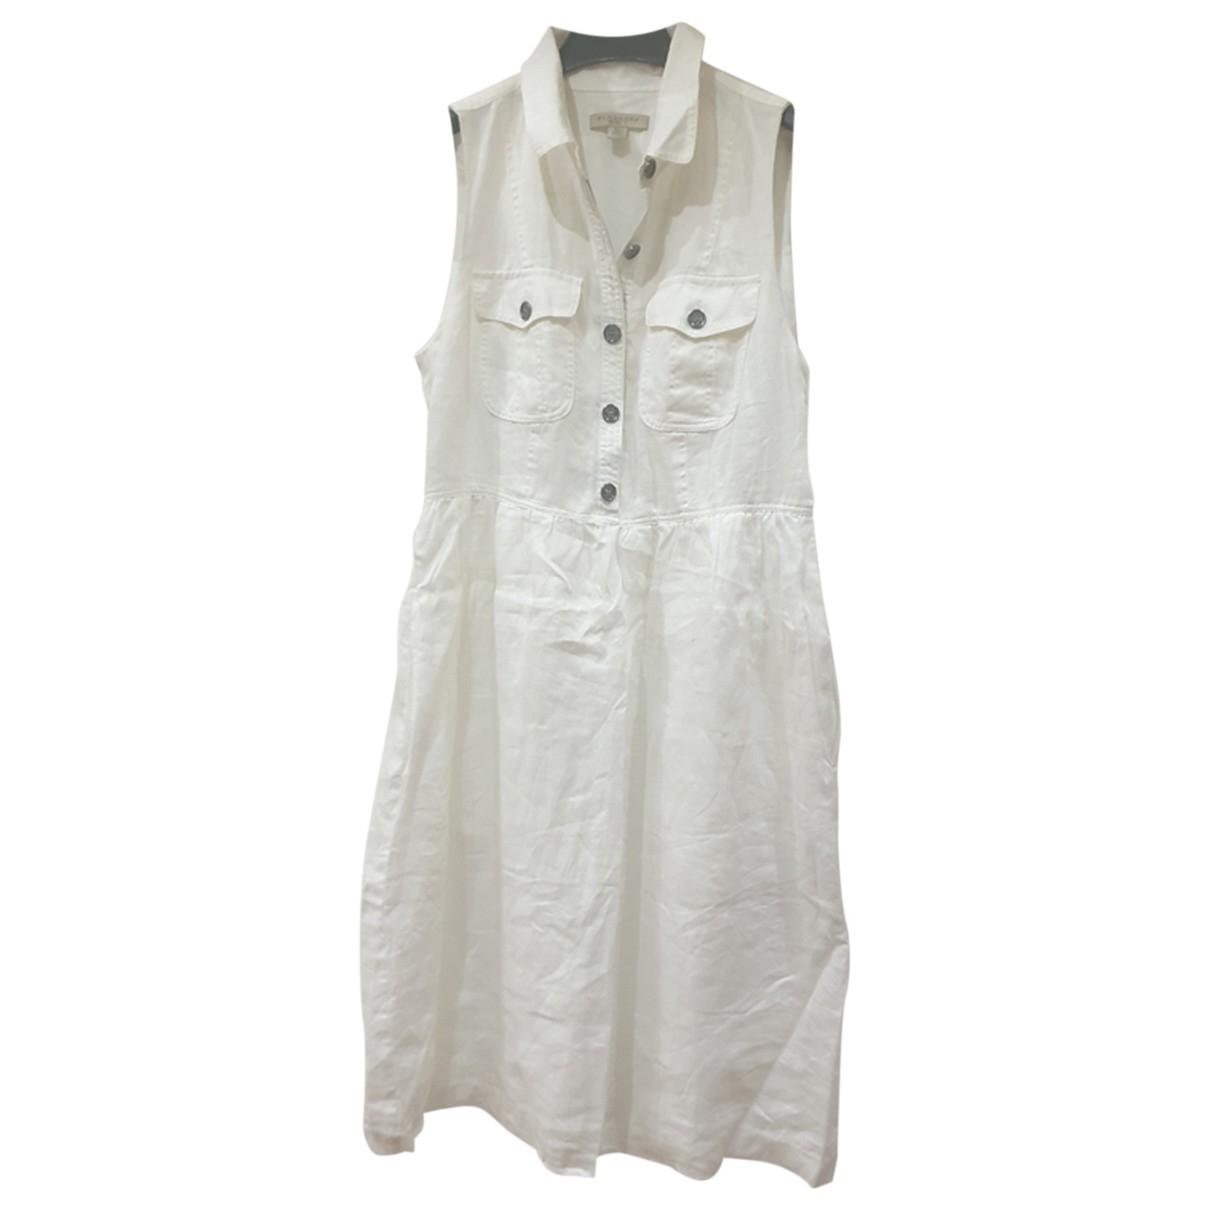 Burberry \N White Cotton dress for Women 38 IT